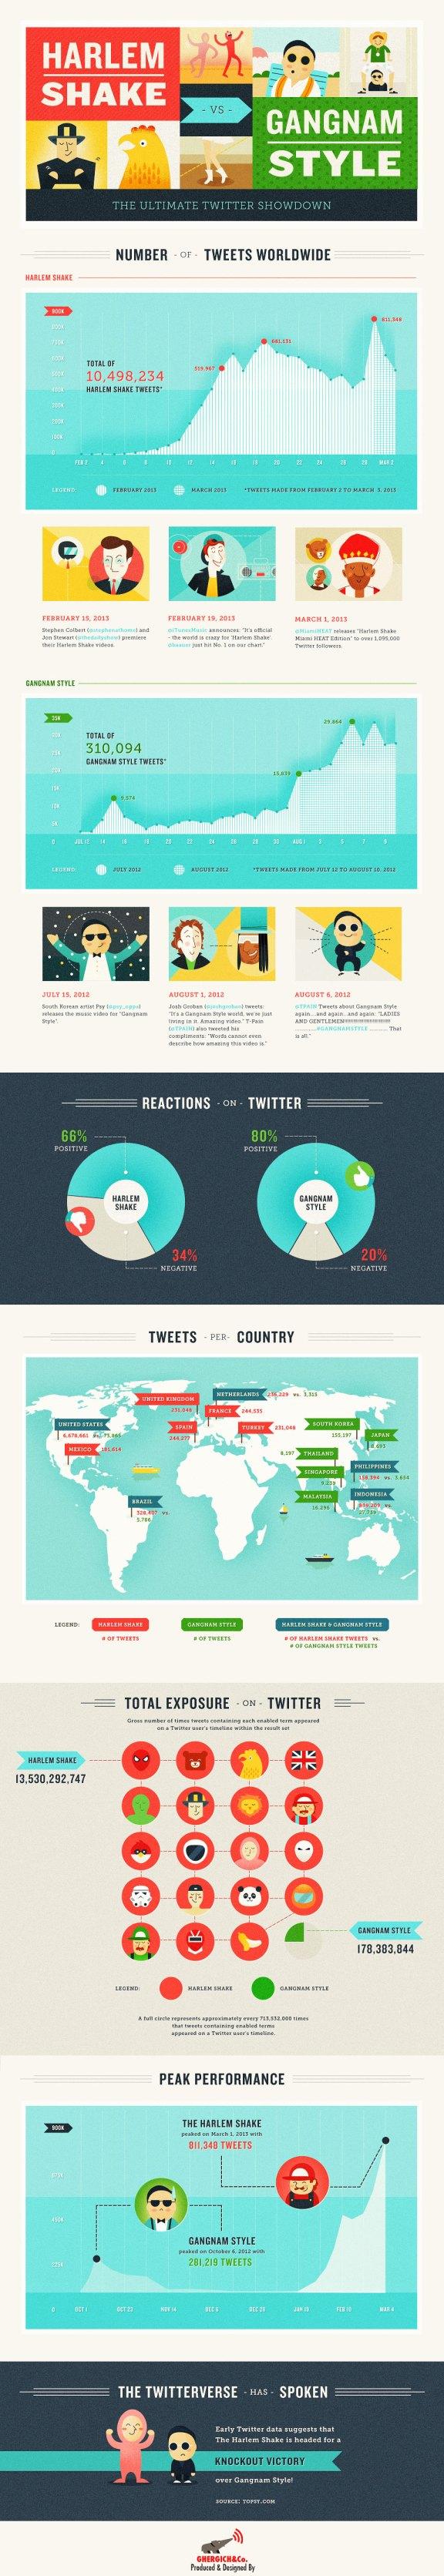 Harlem Shake vs Gangnam Style Infographic